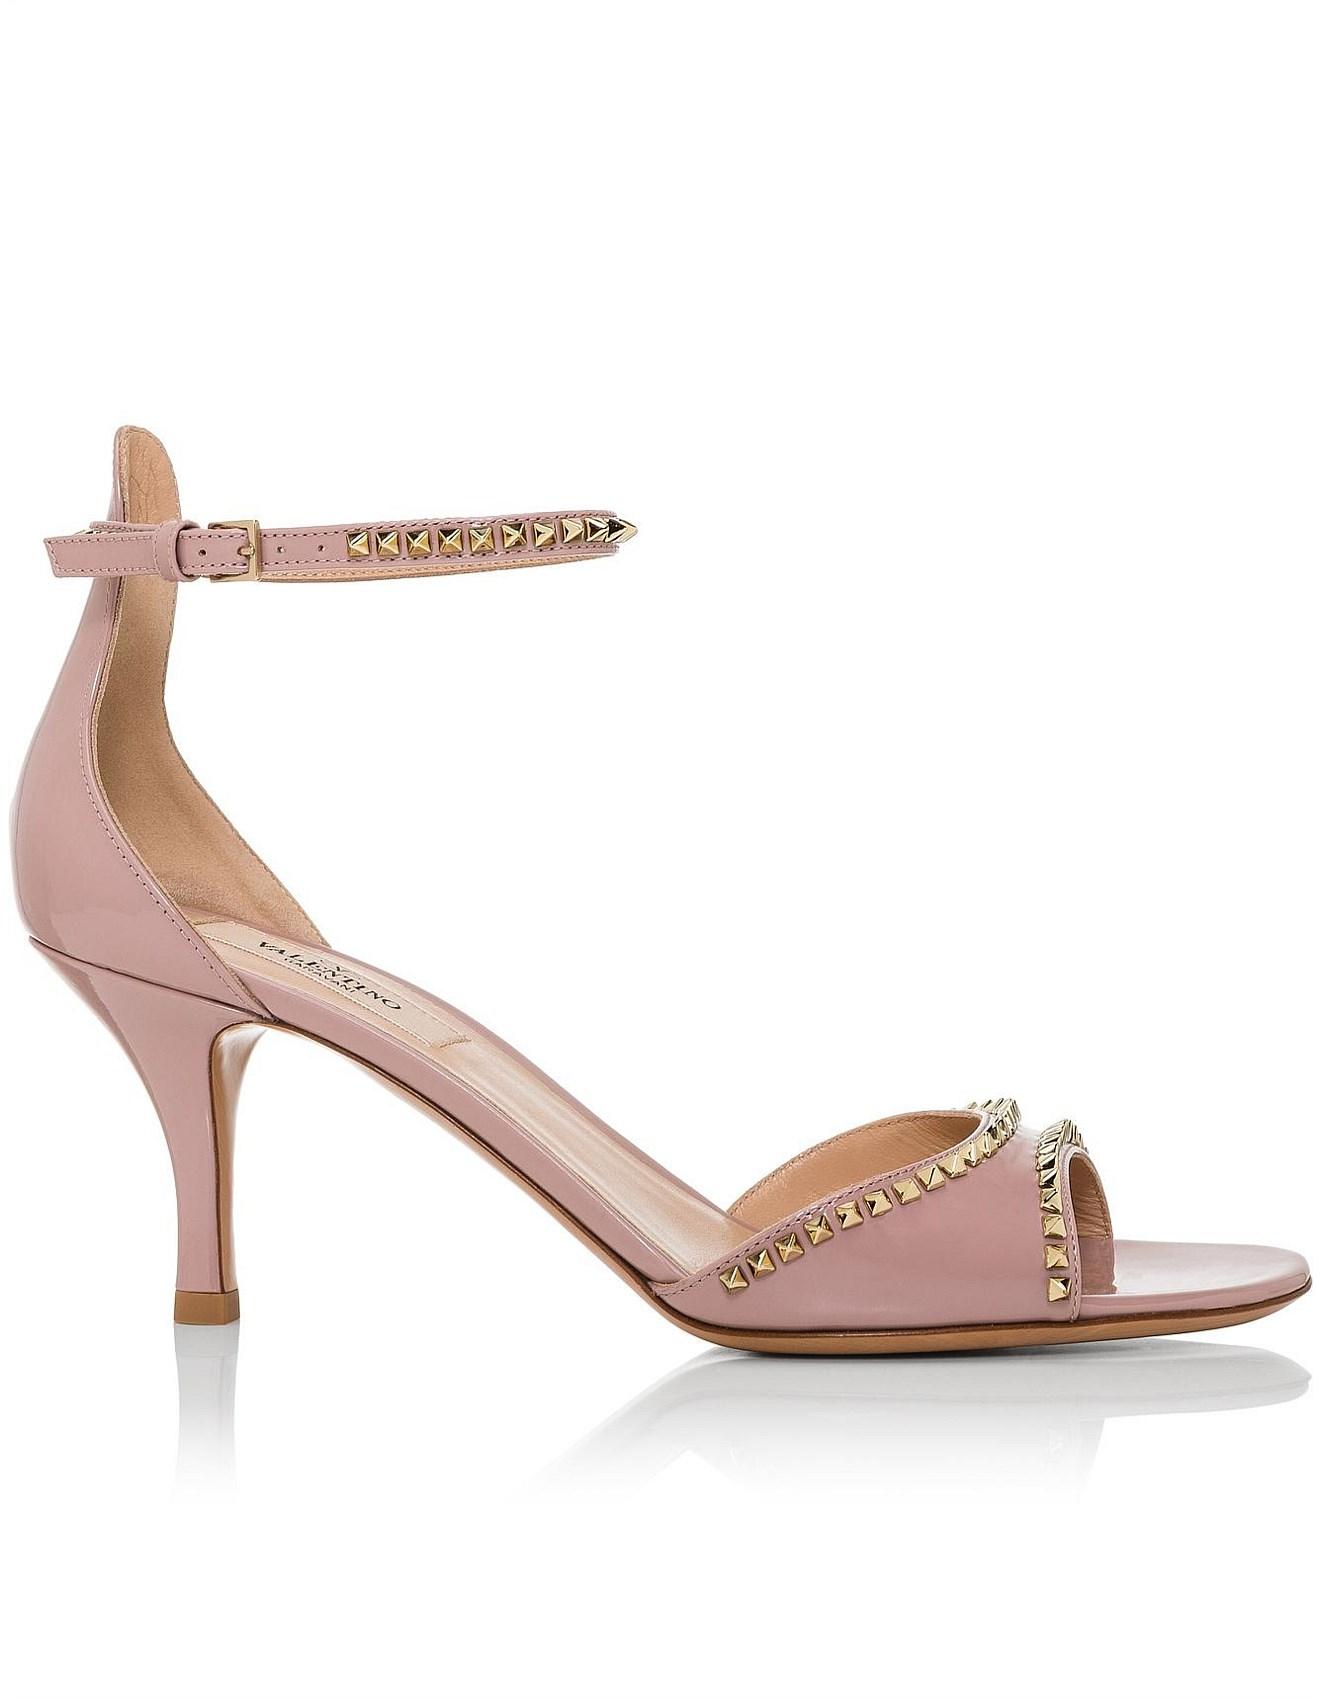 7c5b6c813b Valentino | Buy Valentino Shoes Online | David Jones - ROCKSTUD NO LIMIT  SANDAL